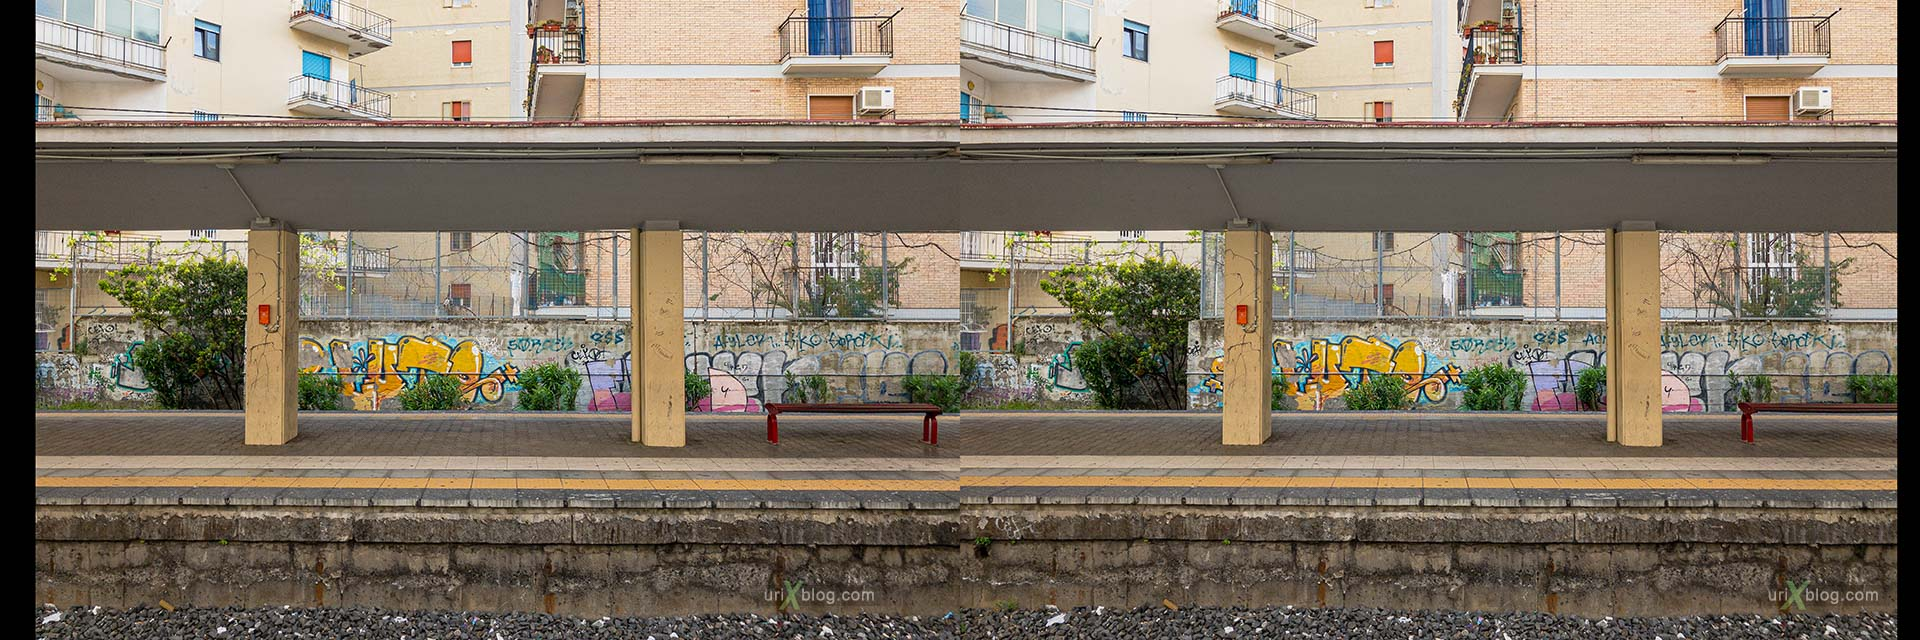 Ercolano, станция, Италия, 3D, перекрёстная стереопара, стерео, стереопара